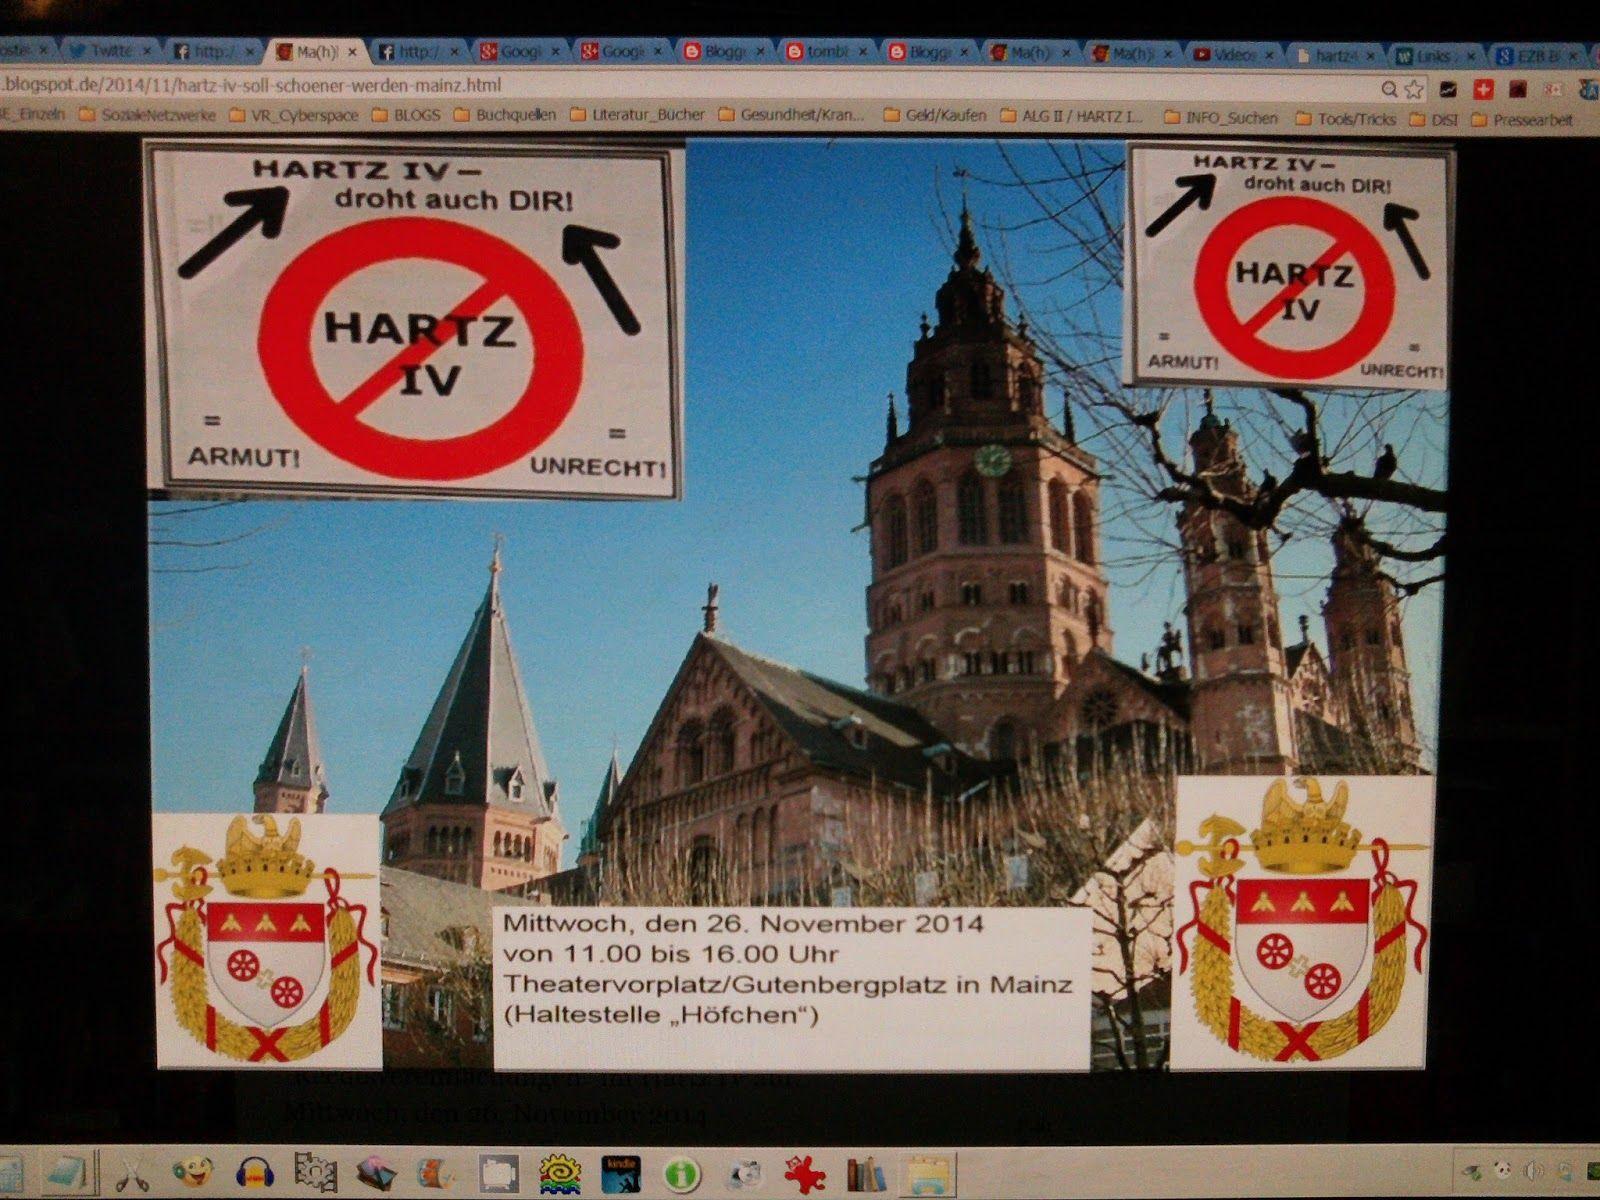 Doku #HartzIV - Kundgebung #Rechtsvereinfachungen #Mainz im Blog: